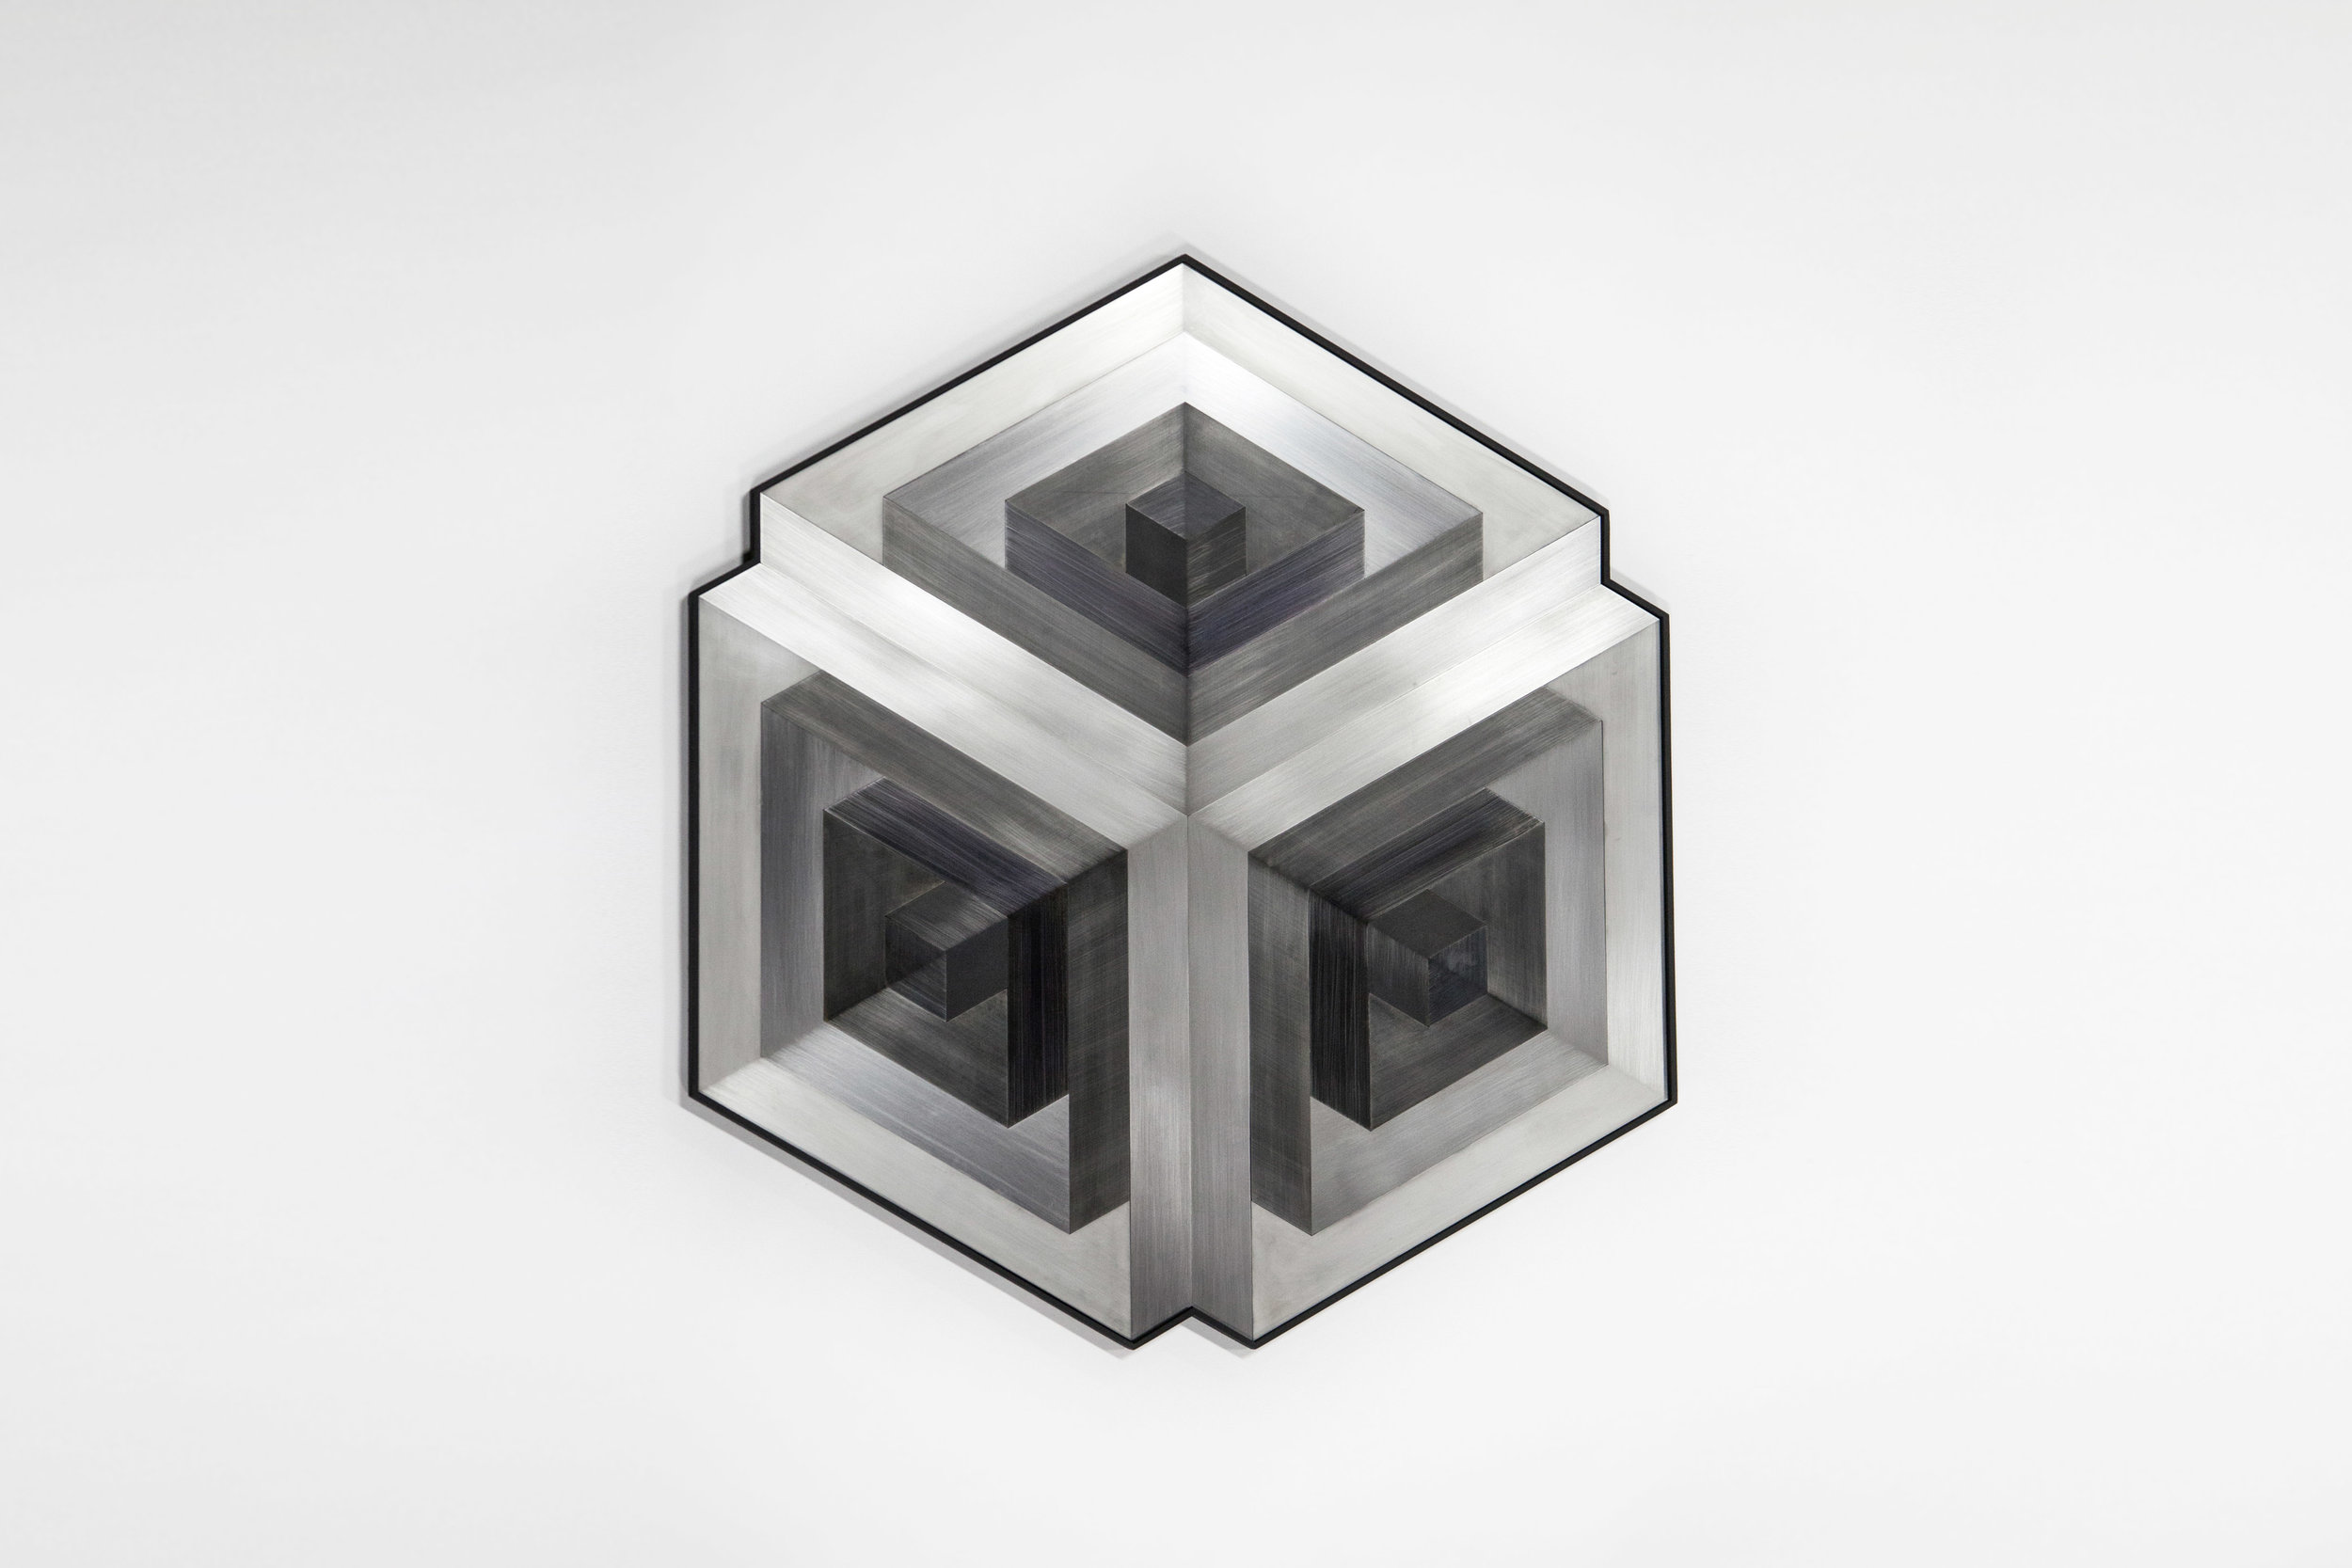 cube-rose-no-2